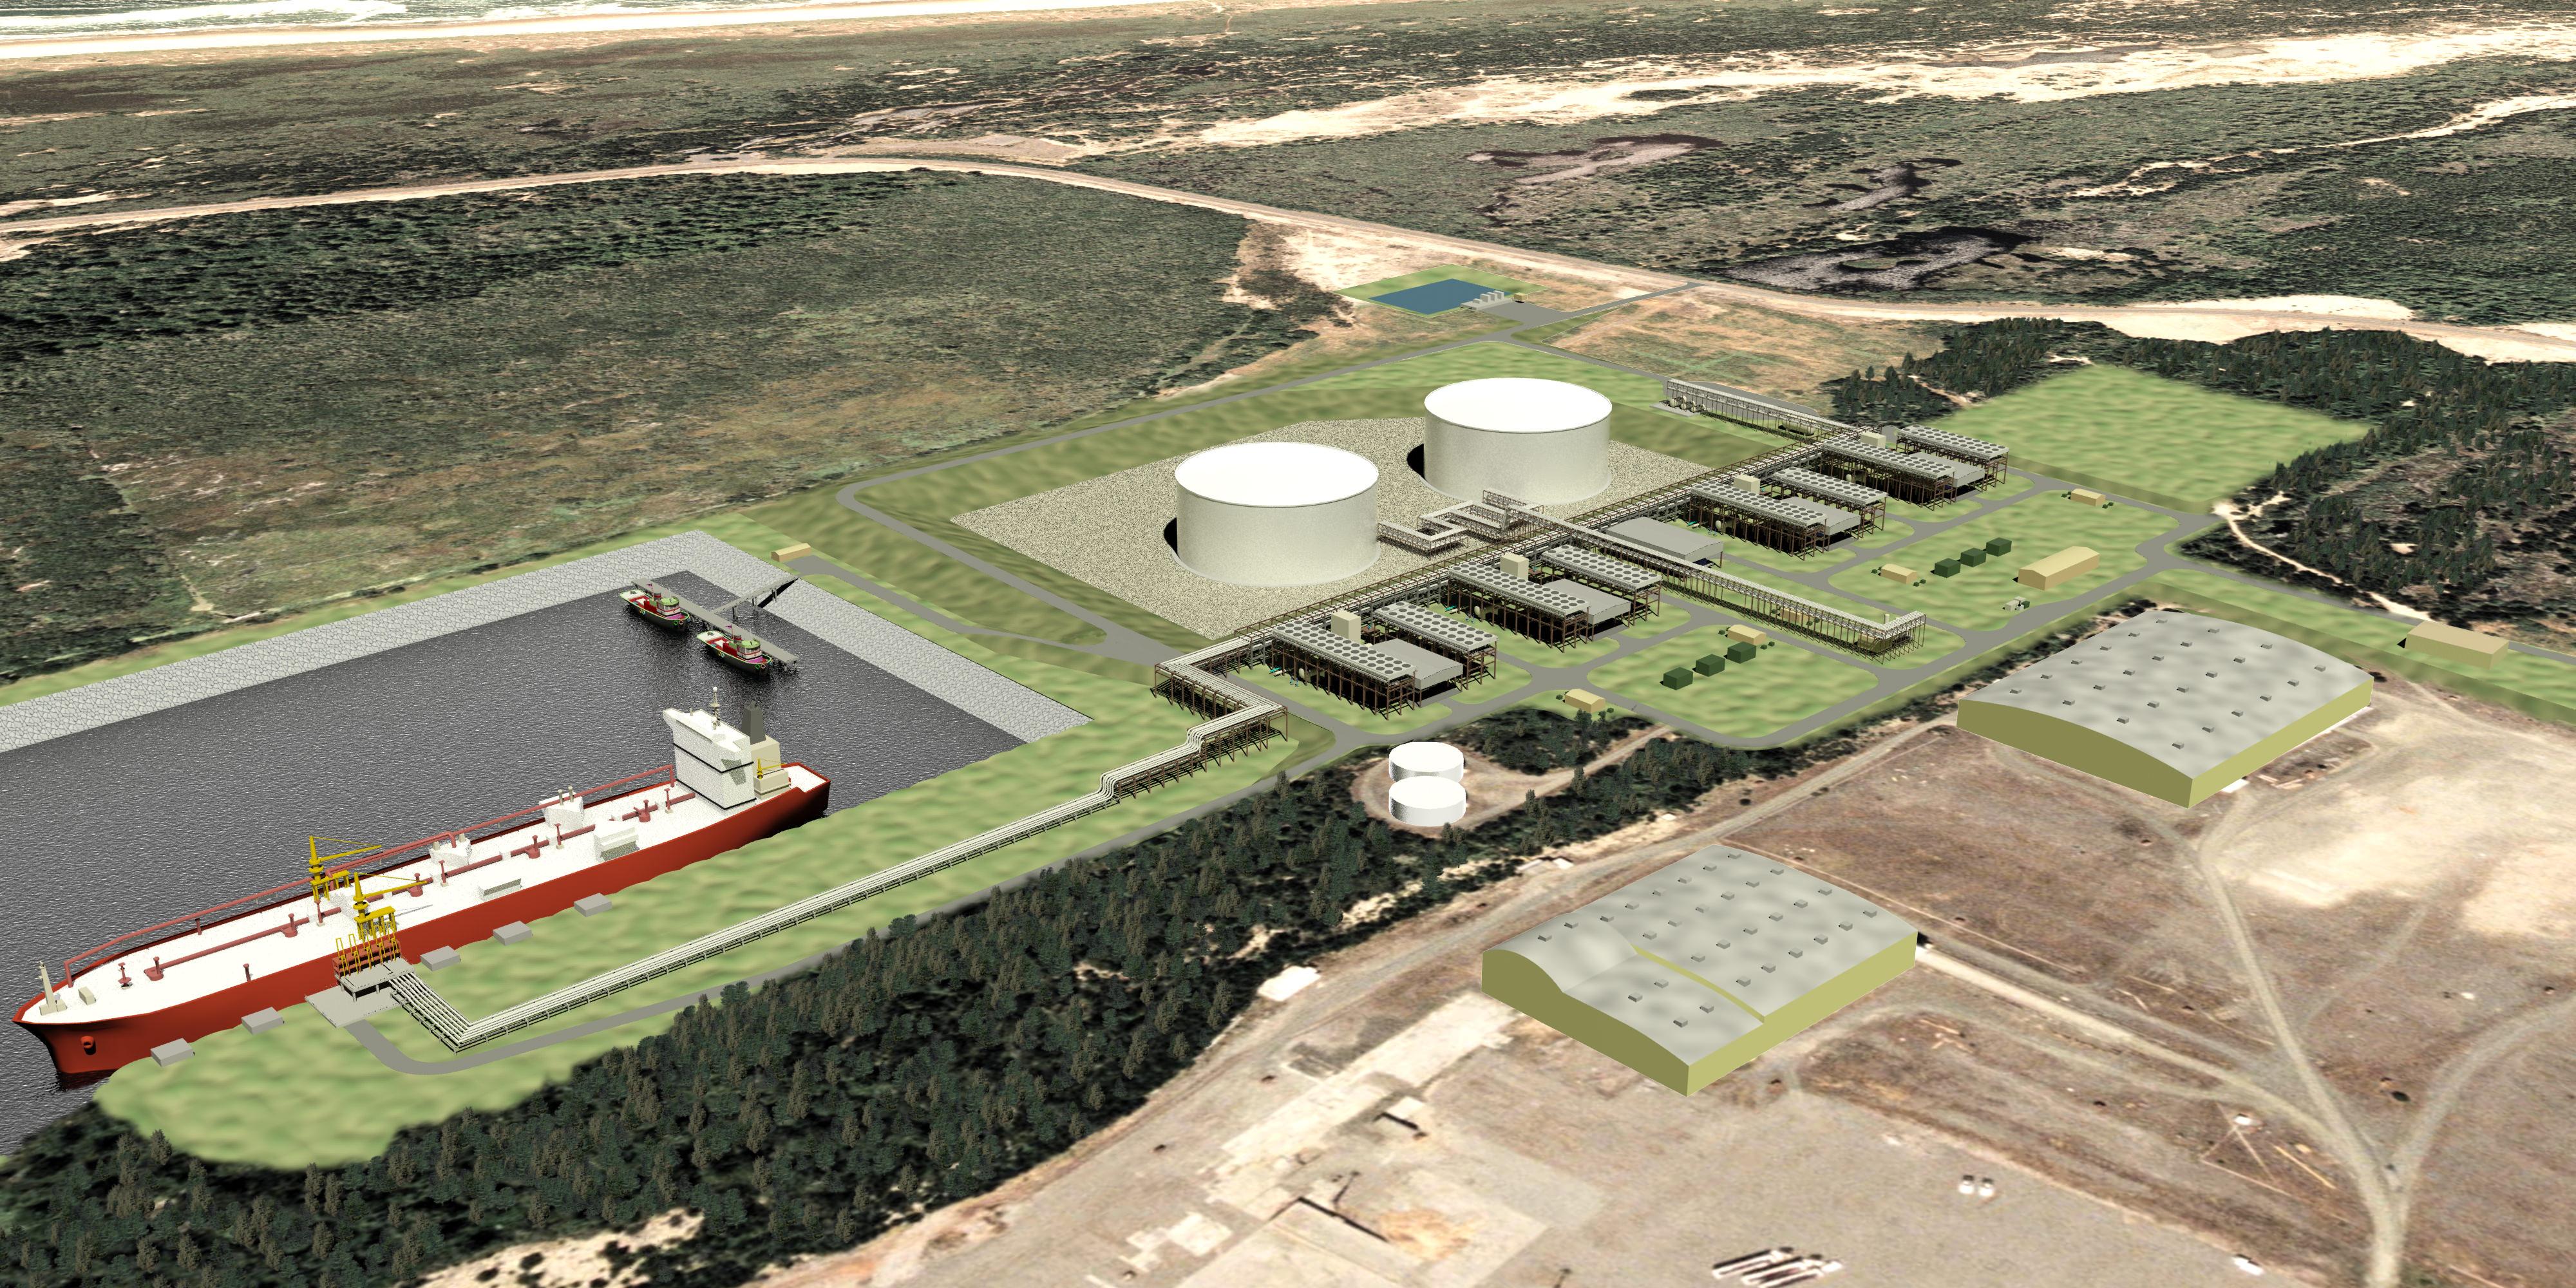 Jordan Cove LNG Terminal